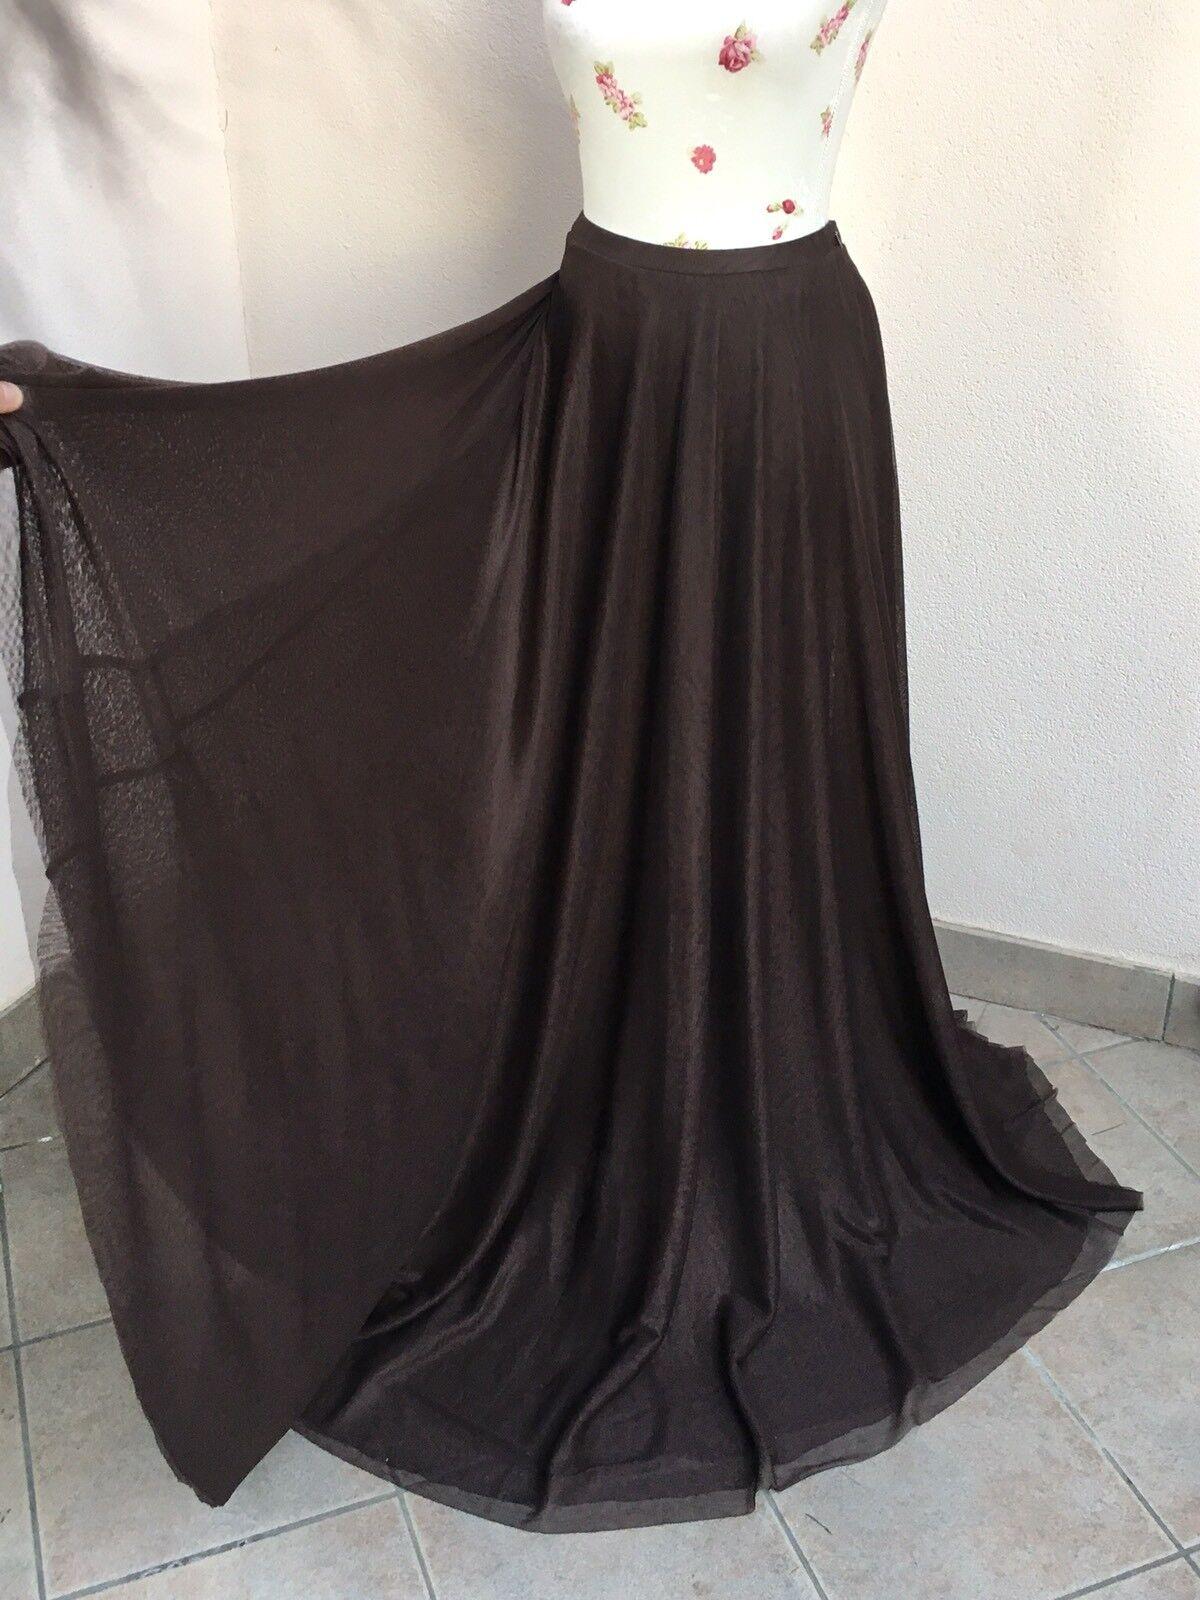 PRINCESSE METROPOLITANE maxi gonna lunga tulle brown 3 strati skirt tg M